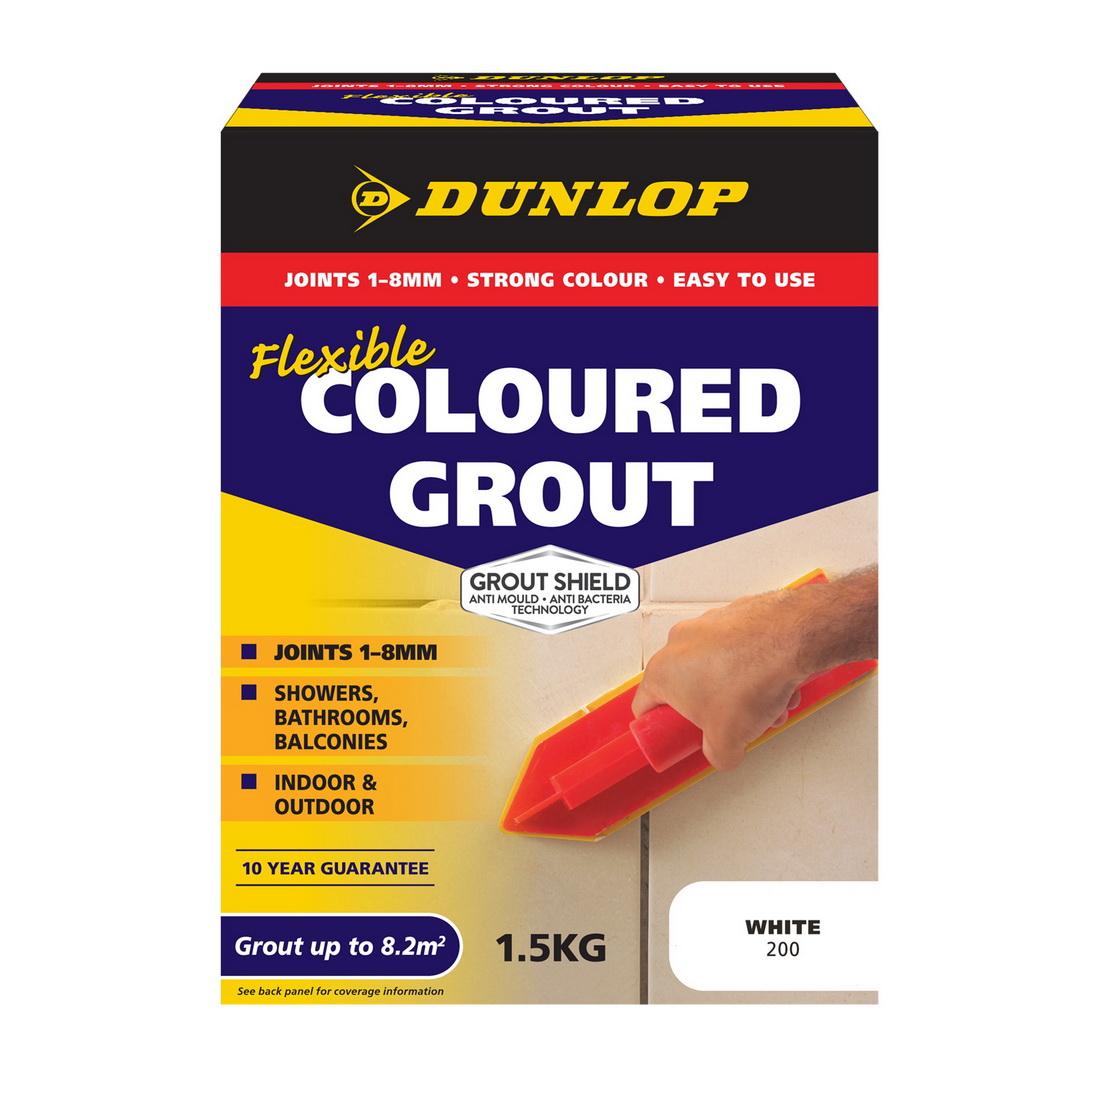 Flexible Coloured Grout Travertine 1.5kg 10336